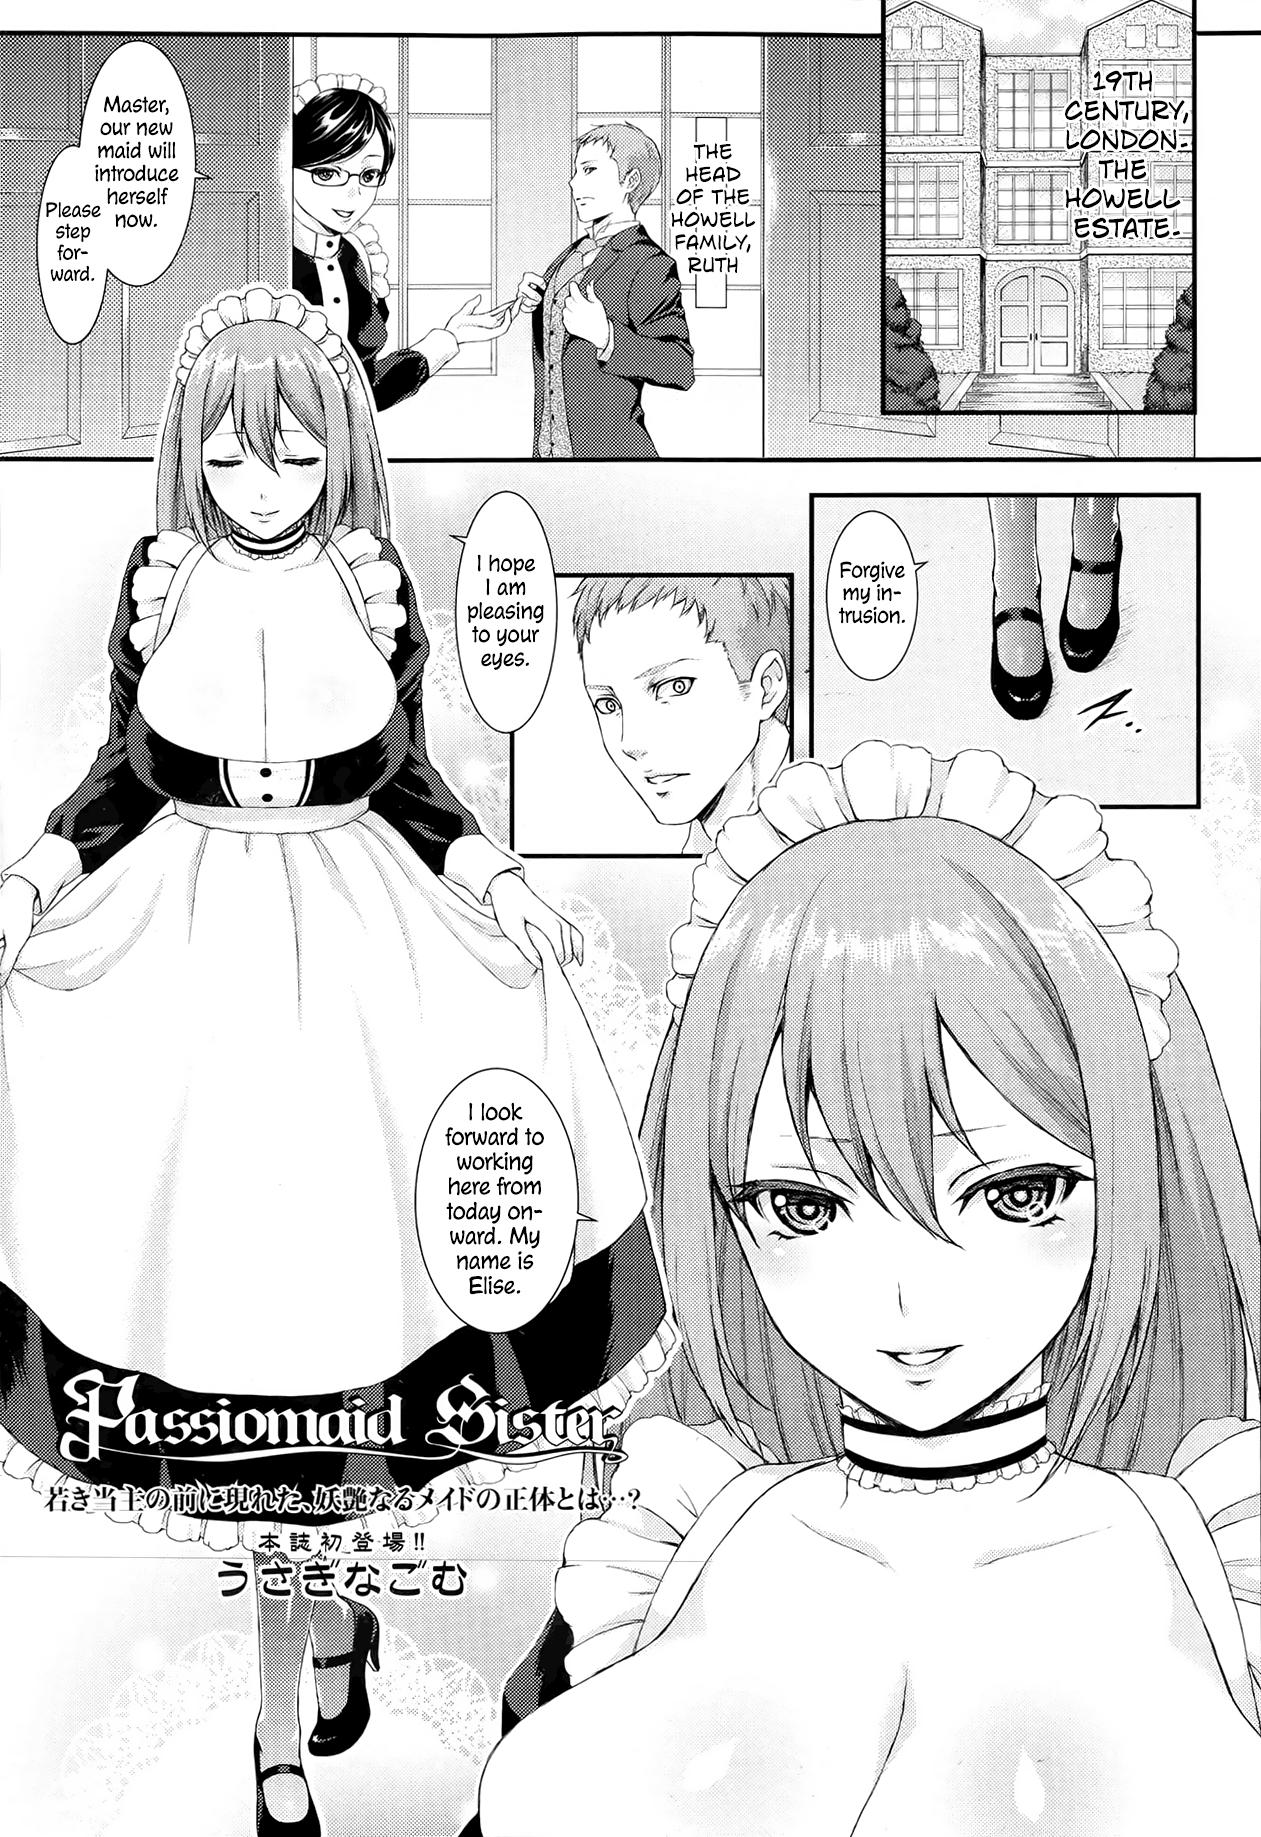 Passiomaid Sister 0